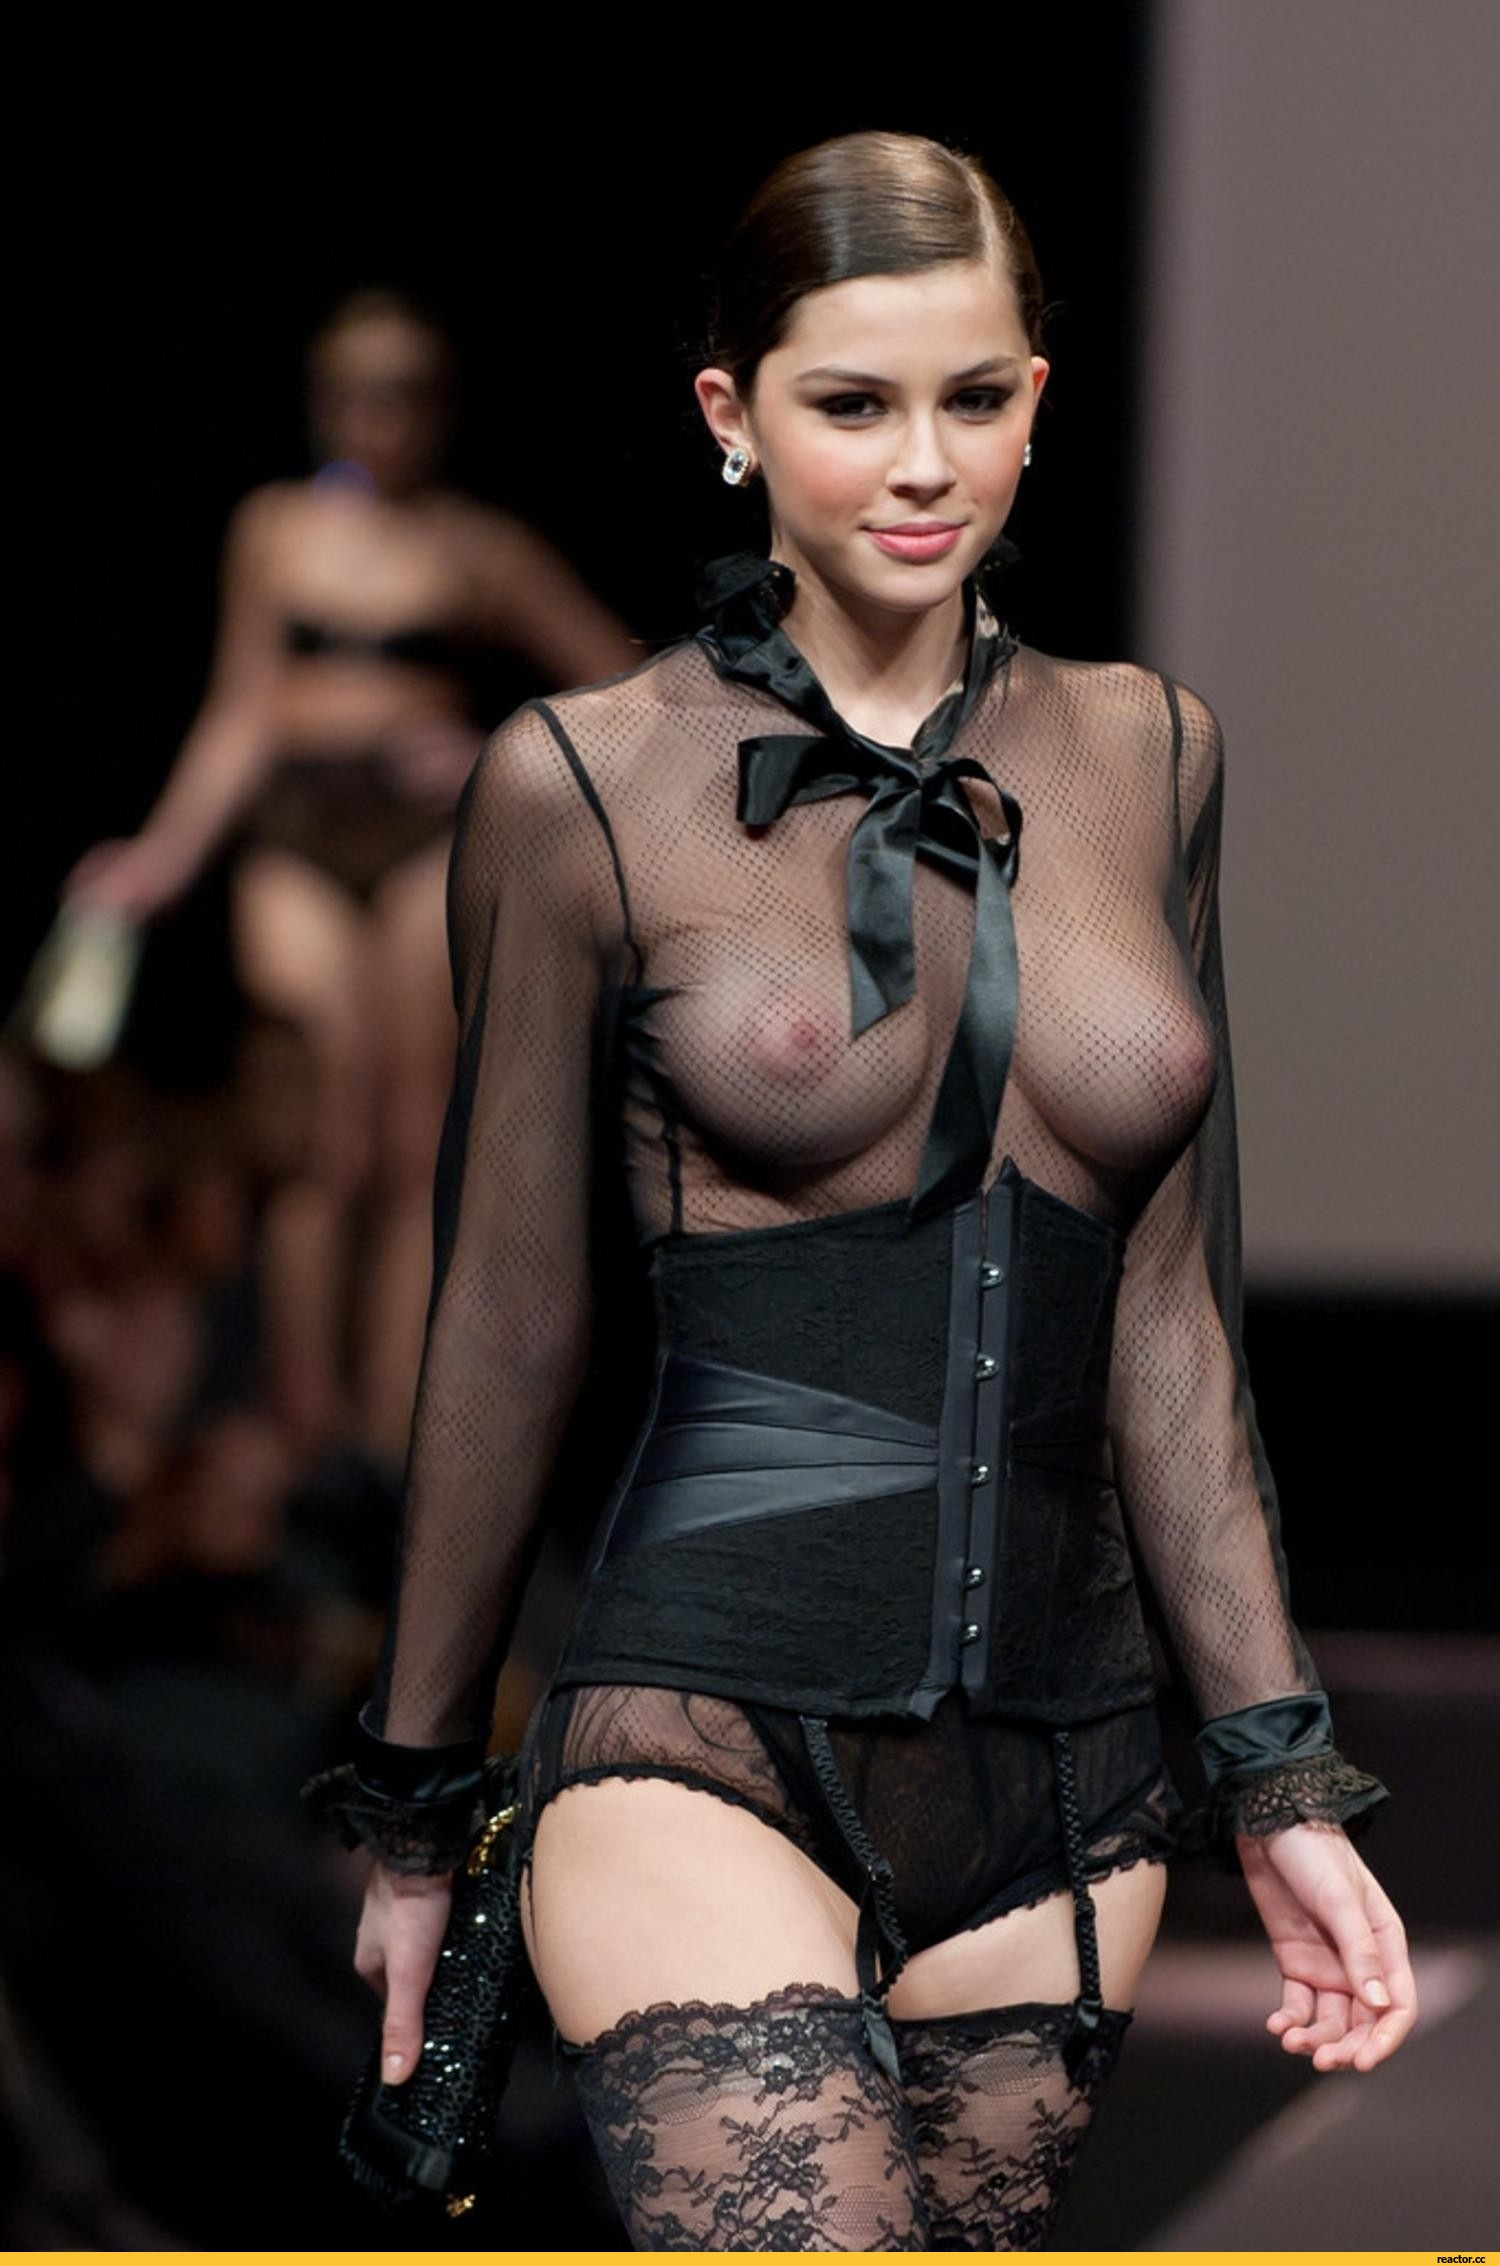 1443427199_pohotinet.ru_madalina-pica-perfect-supperb-erotika-1081958